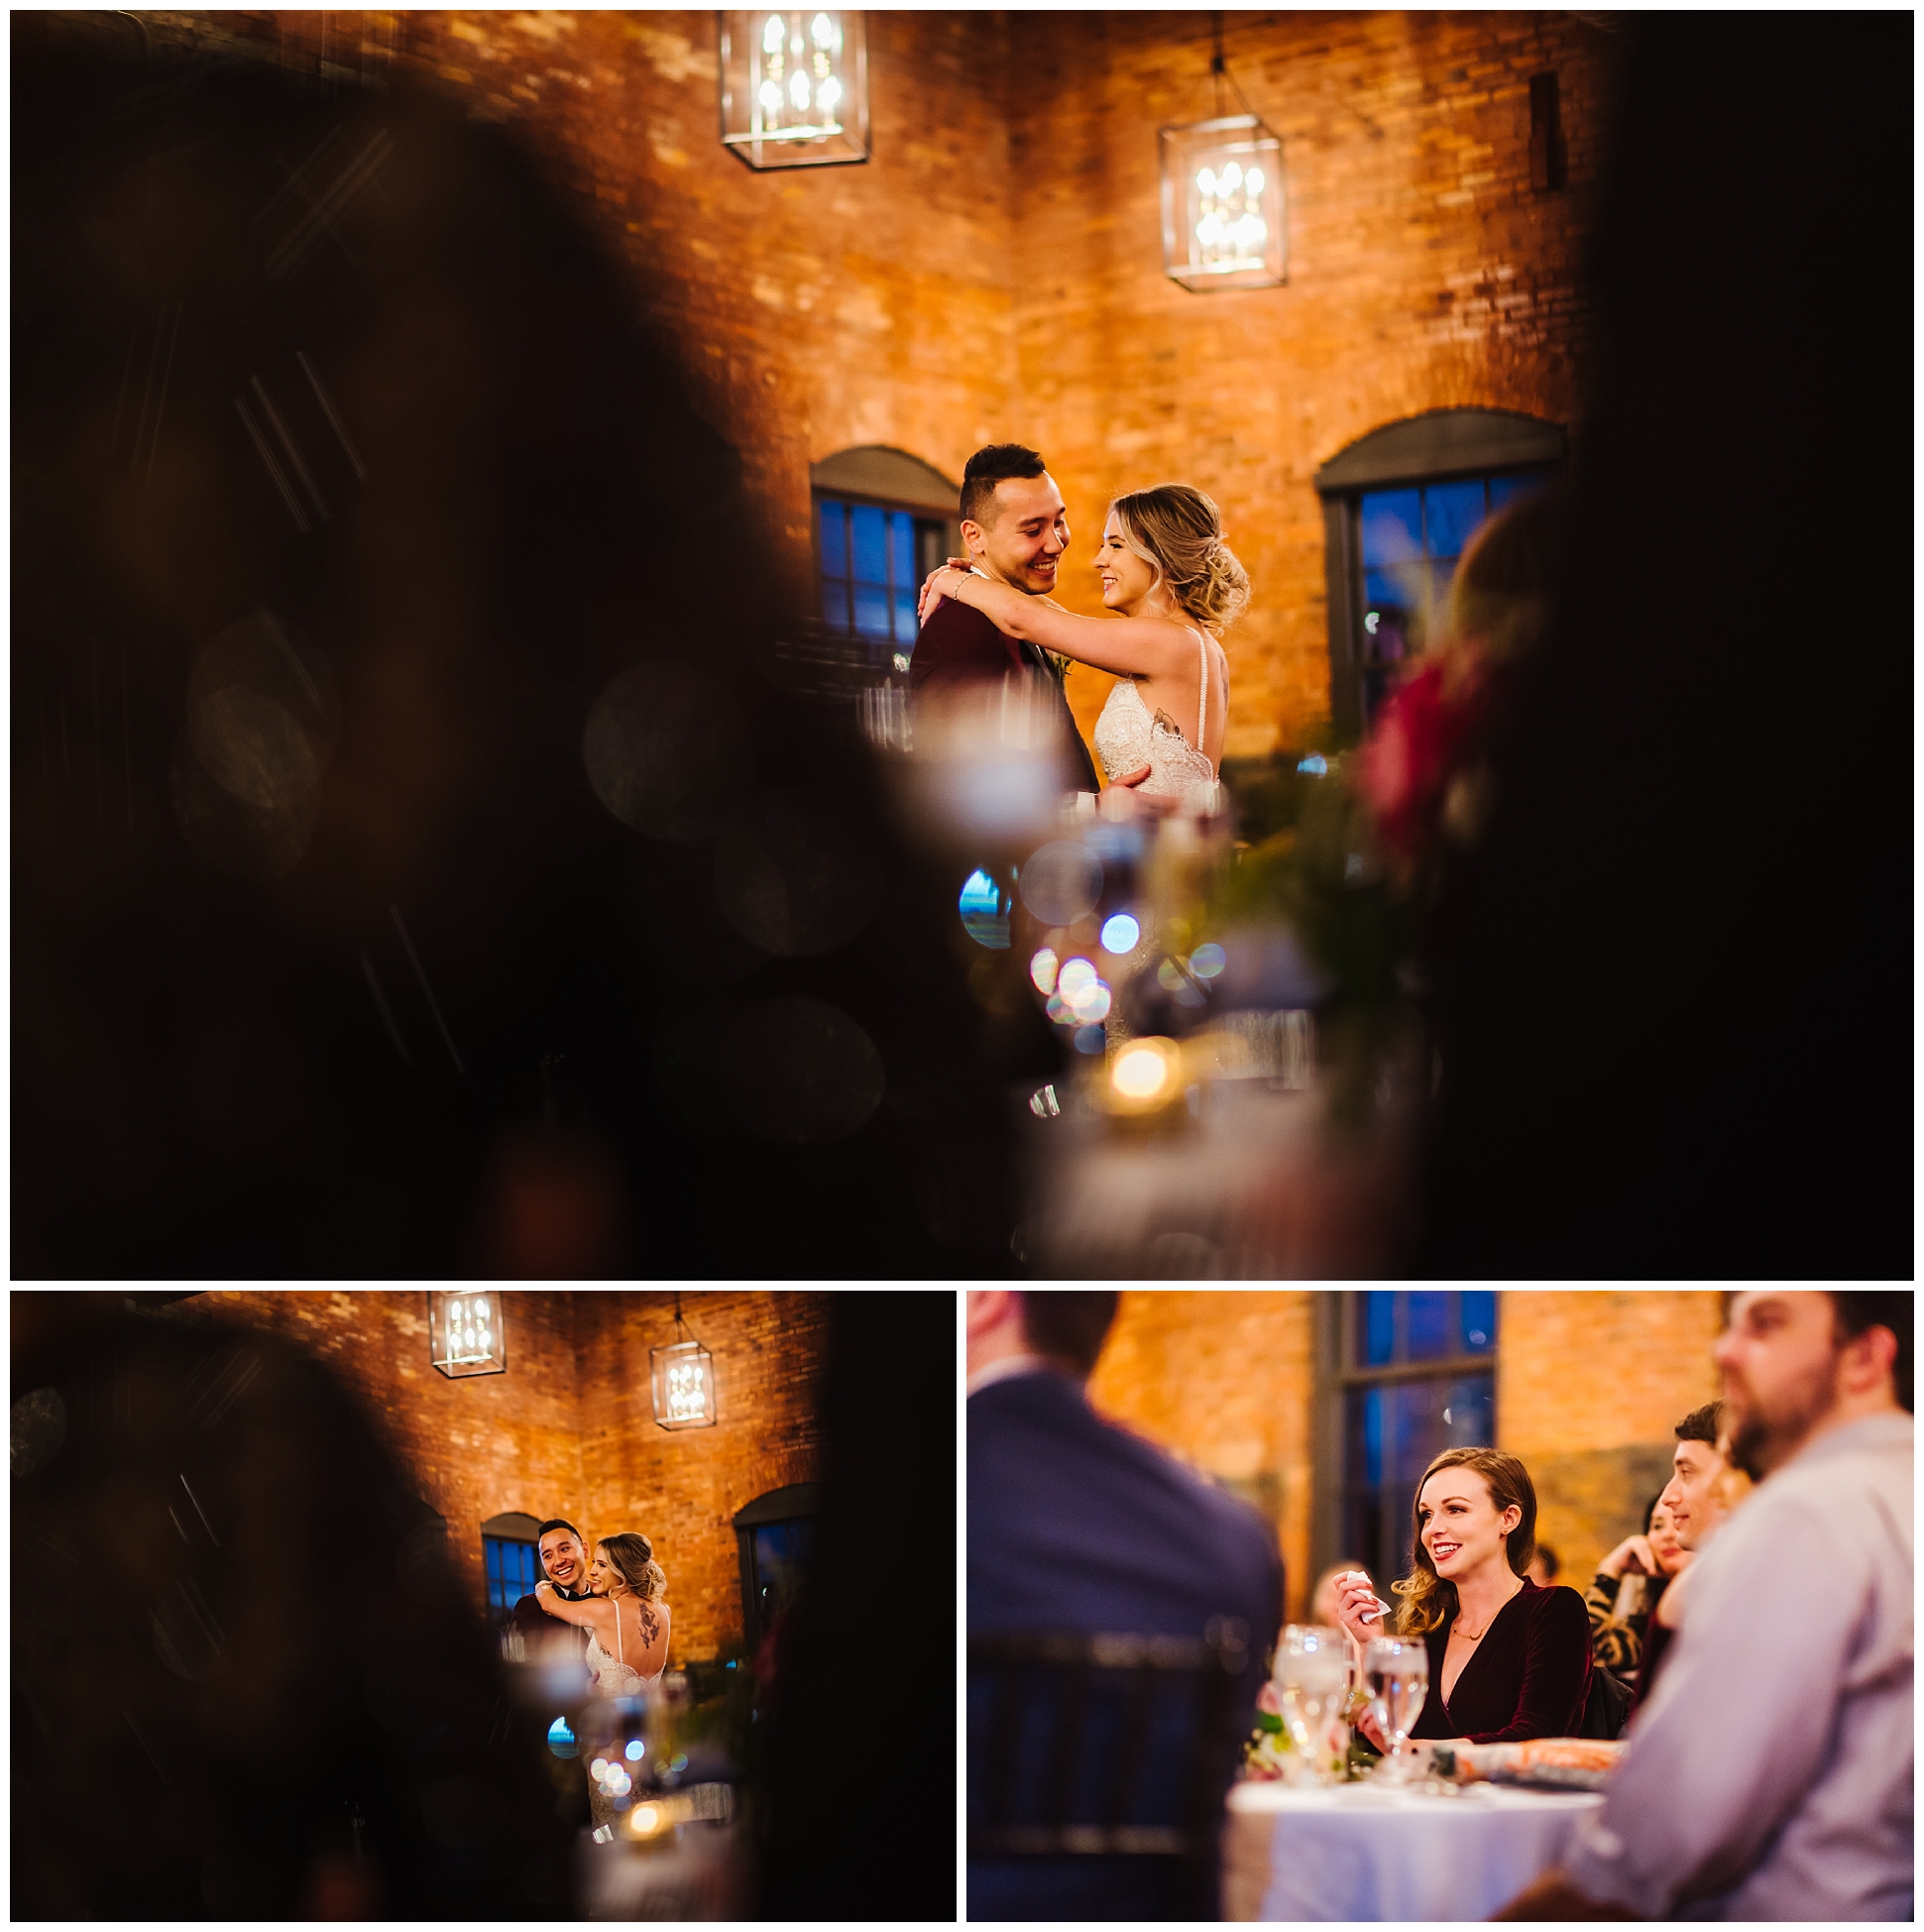 tampa-armeture-wedding-photographer-edgy-industrial-downtown-fancy-free-nursery-tattoo-burgandy-velvet_0072.jpg